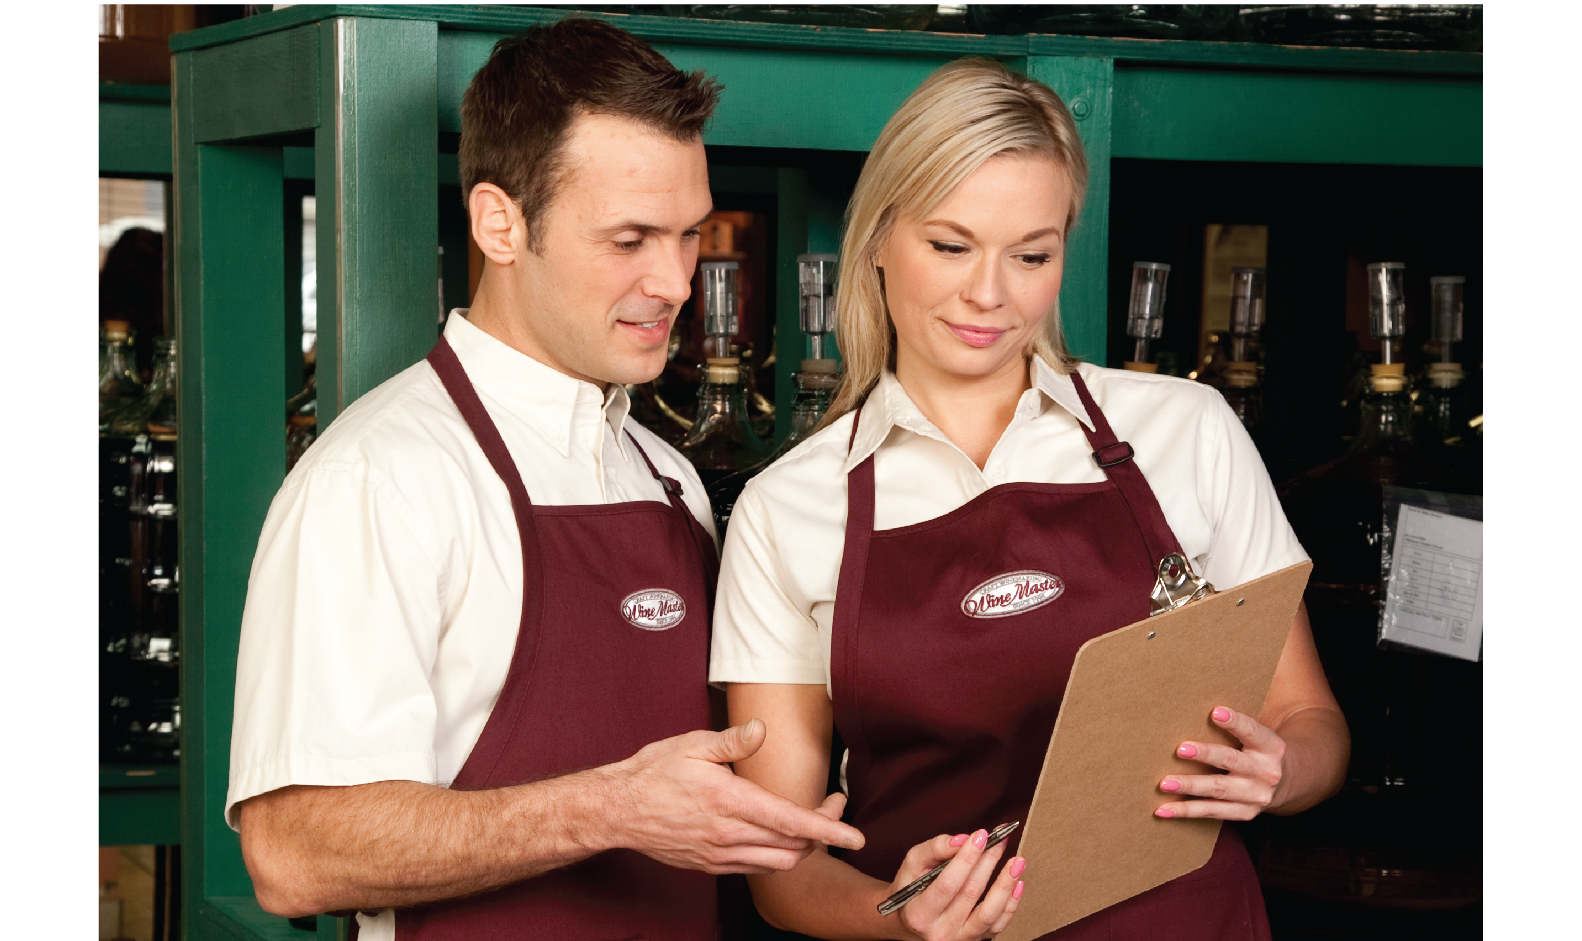 Customer Service and Hospitality